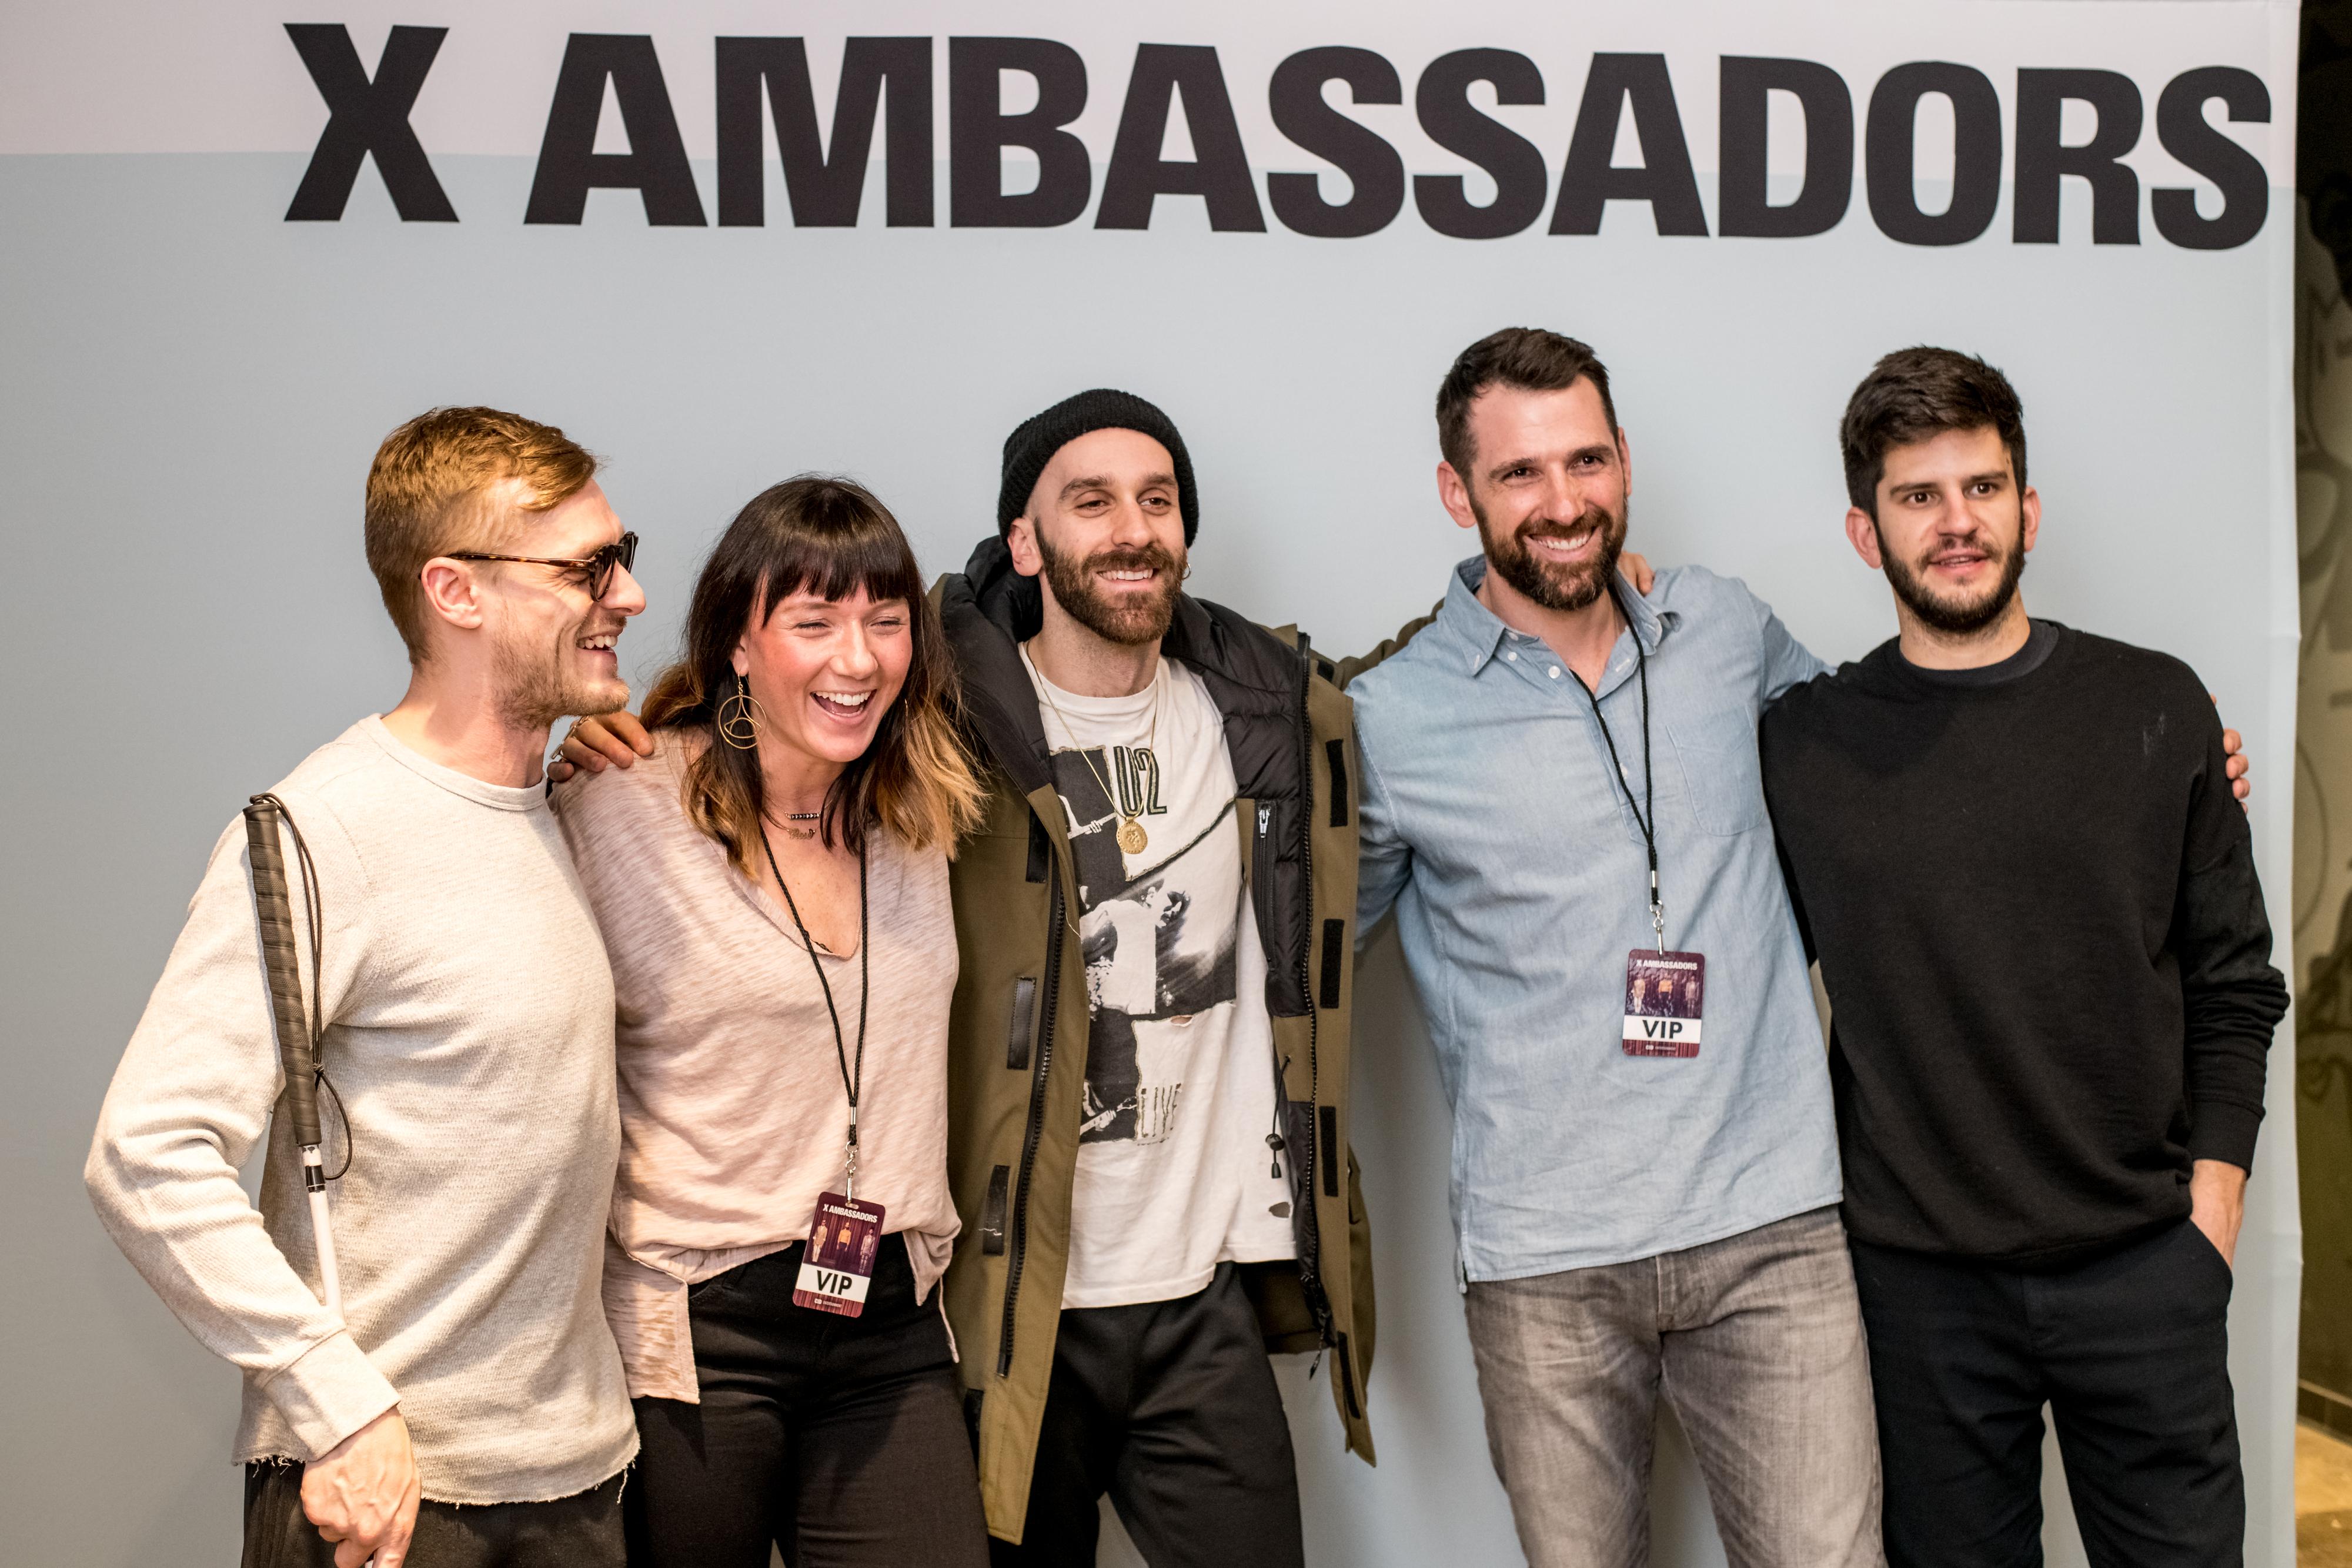 X Ambassadors Vip Ticket Packages The Joyful Tour 2018